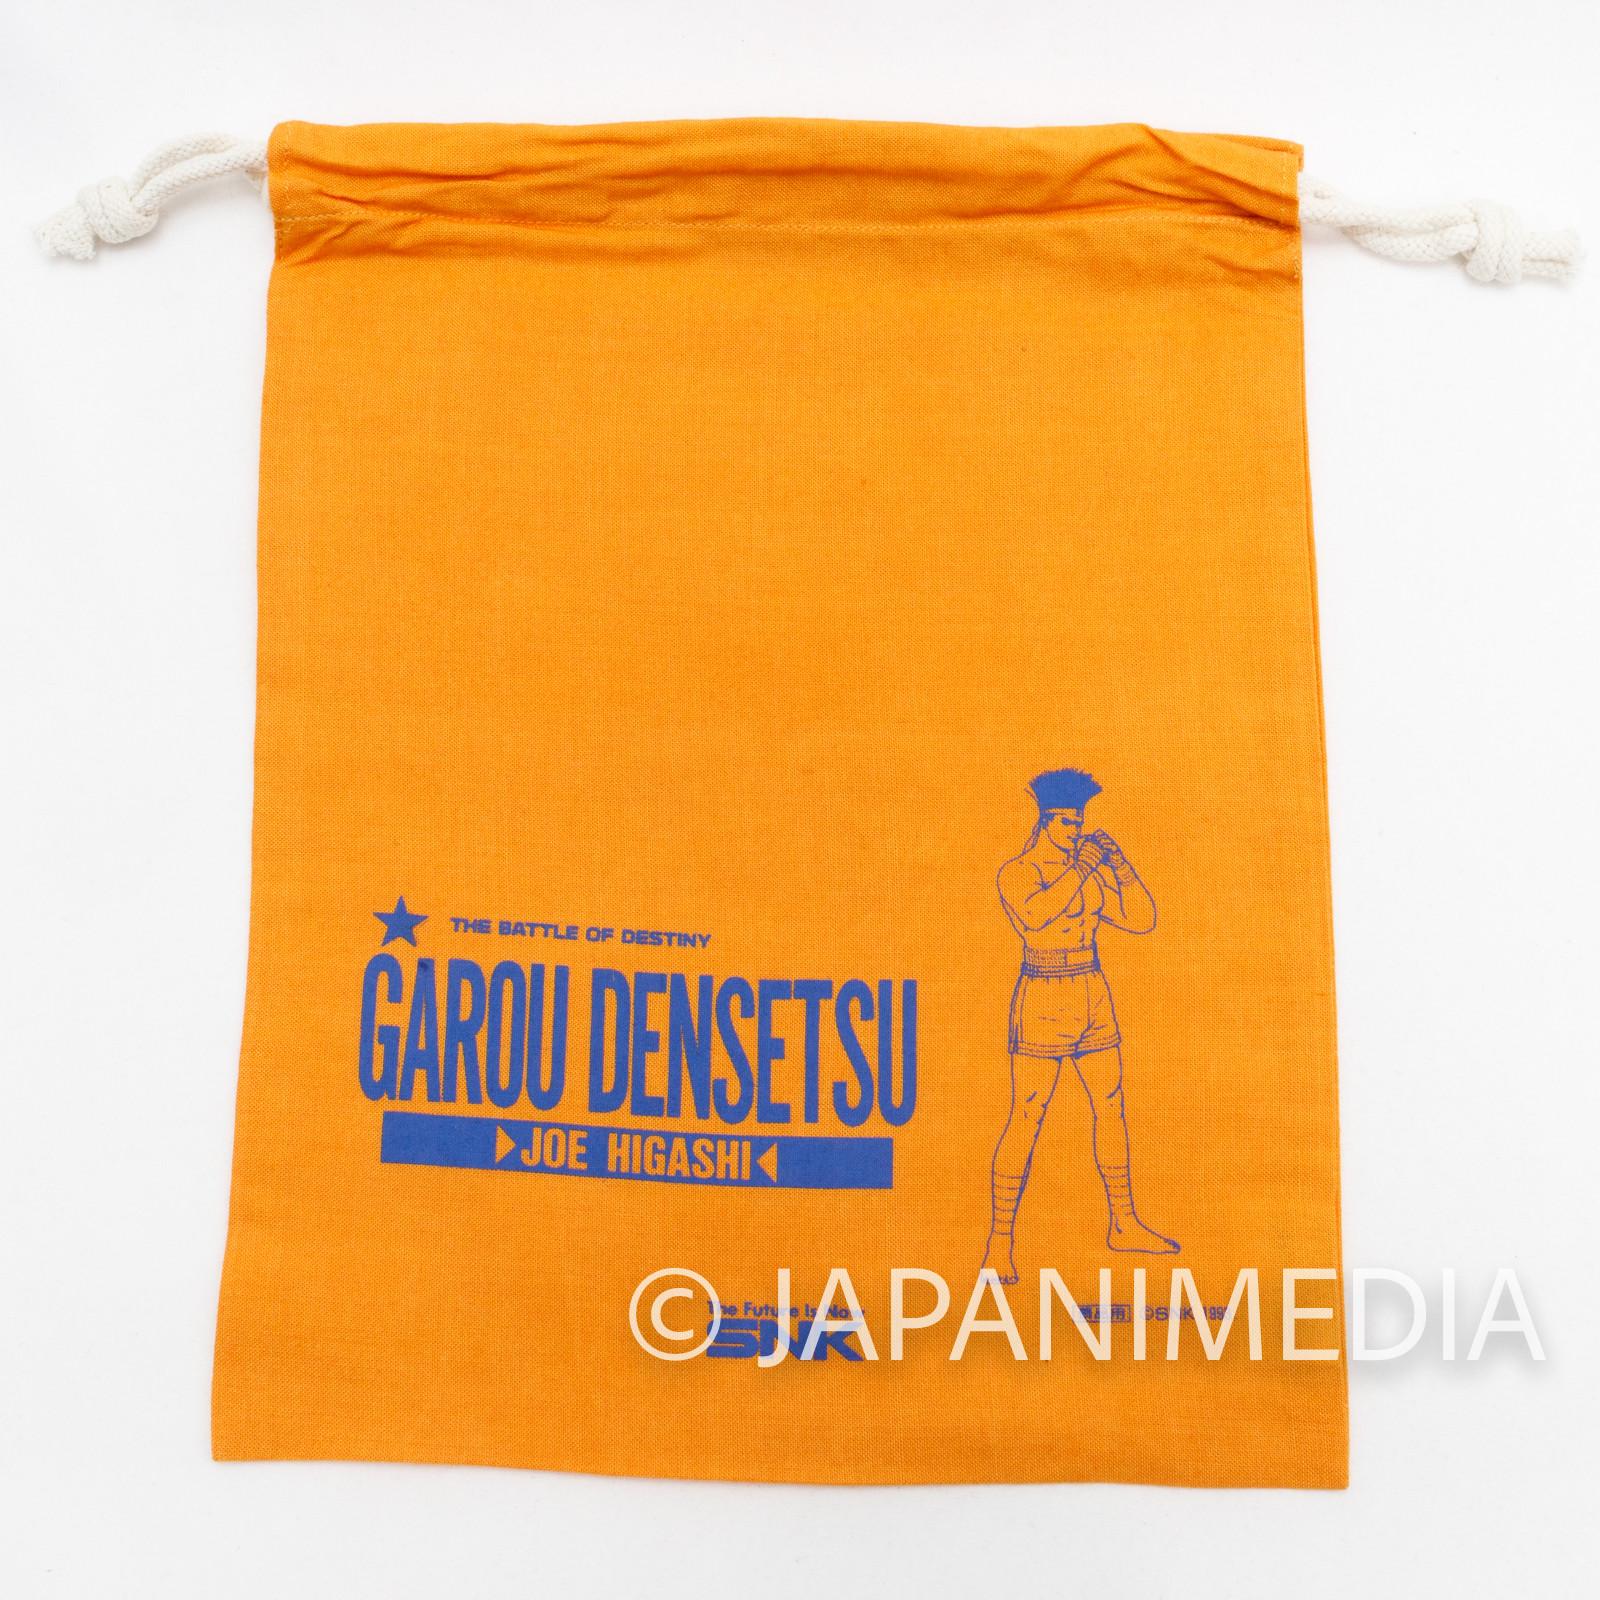 Garou Densetsu Fatal Fury Drawstring Bag Joe Higashi Orange SNK NEOGEO